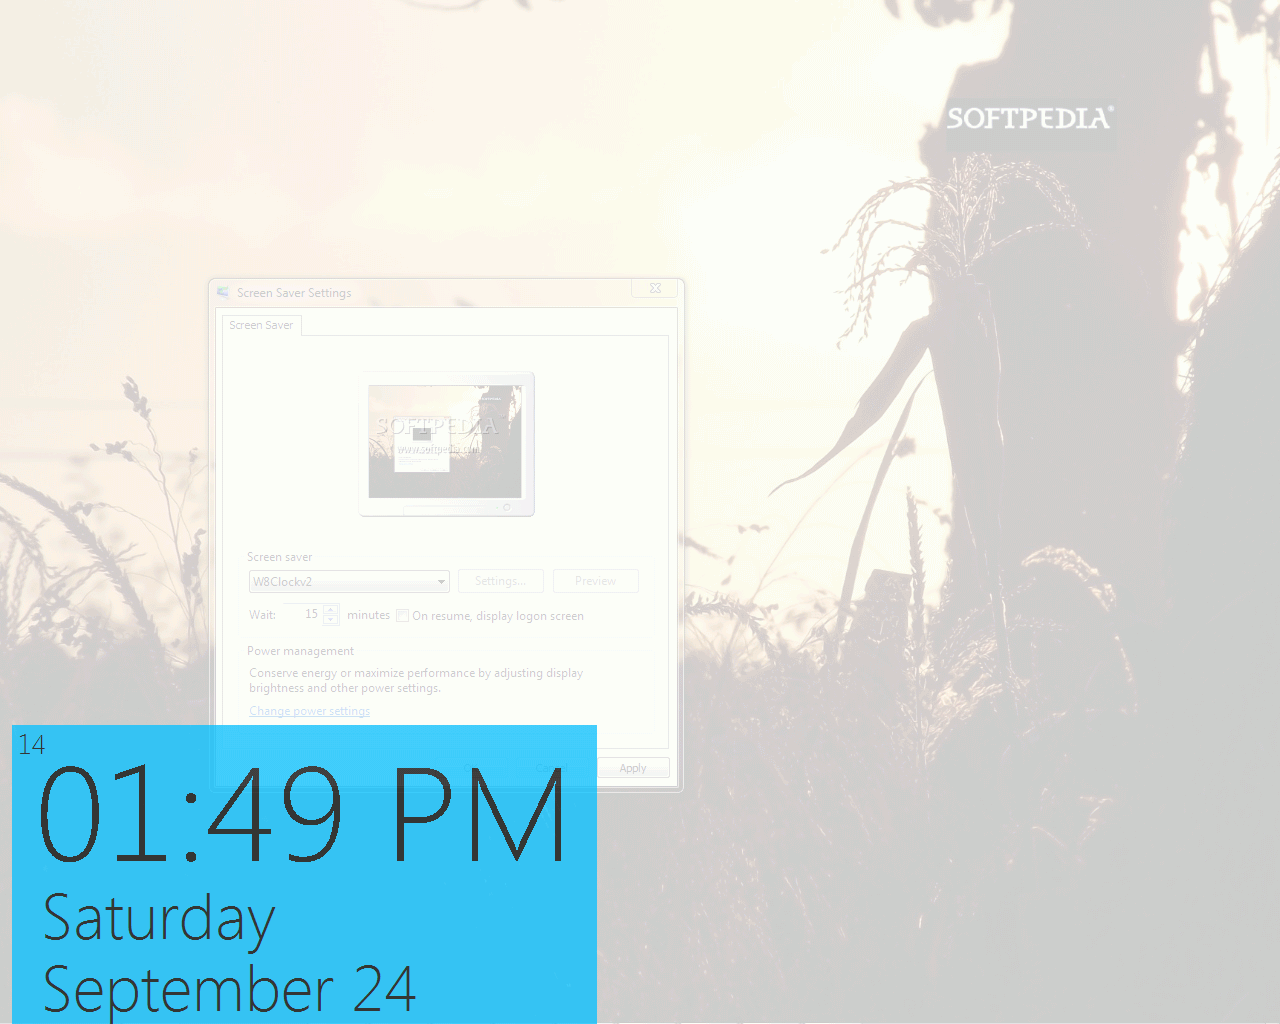 download windows 8 clock screensaver 2